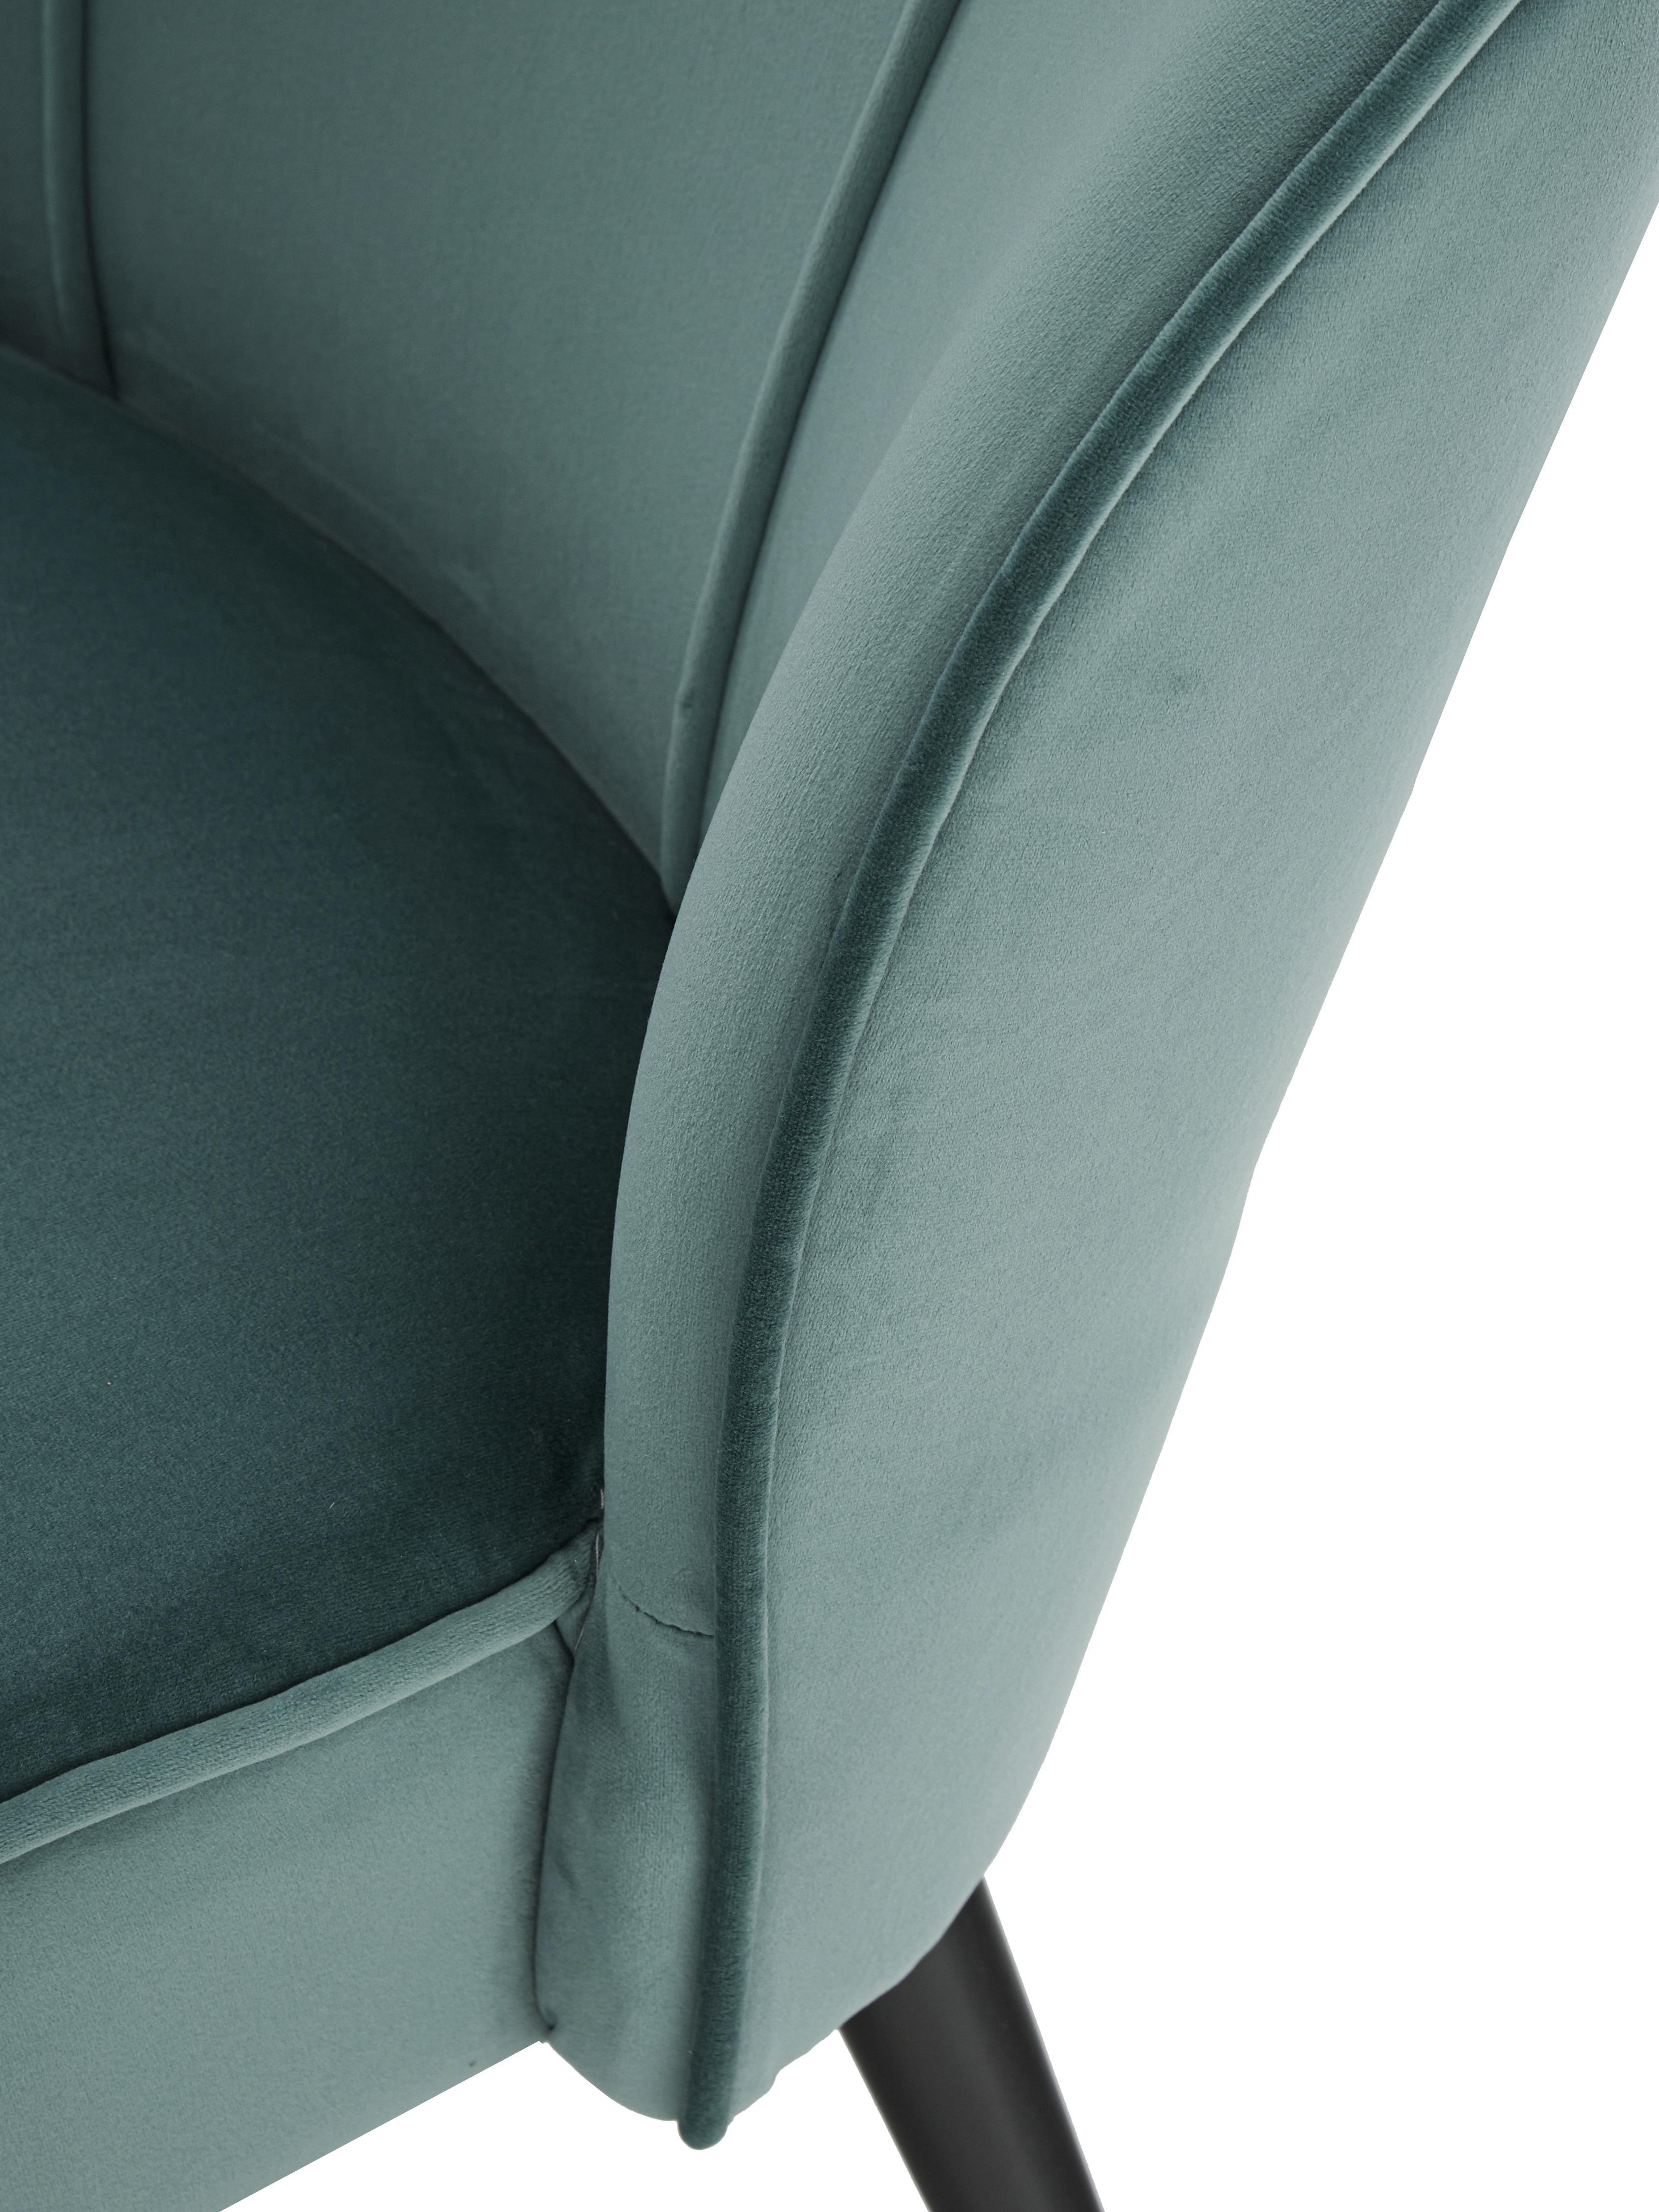 Samt-Cocktailsessel Lucky in Blaugrün, Bezug: Samt (Polyester) 30.000 S, Samt Blaugrün, B 59 x T 68 cm